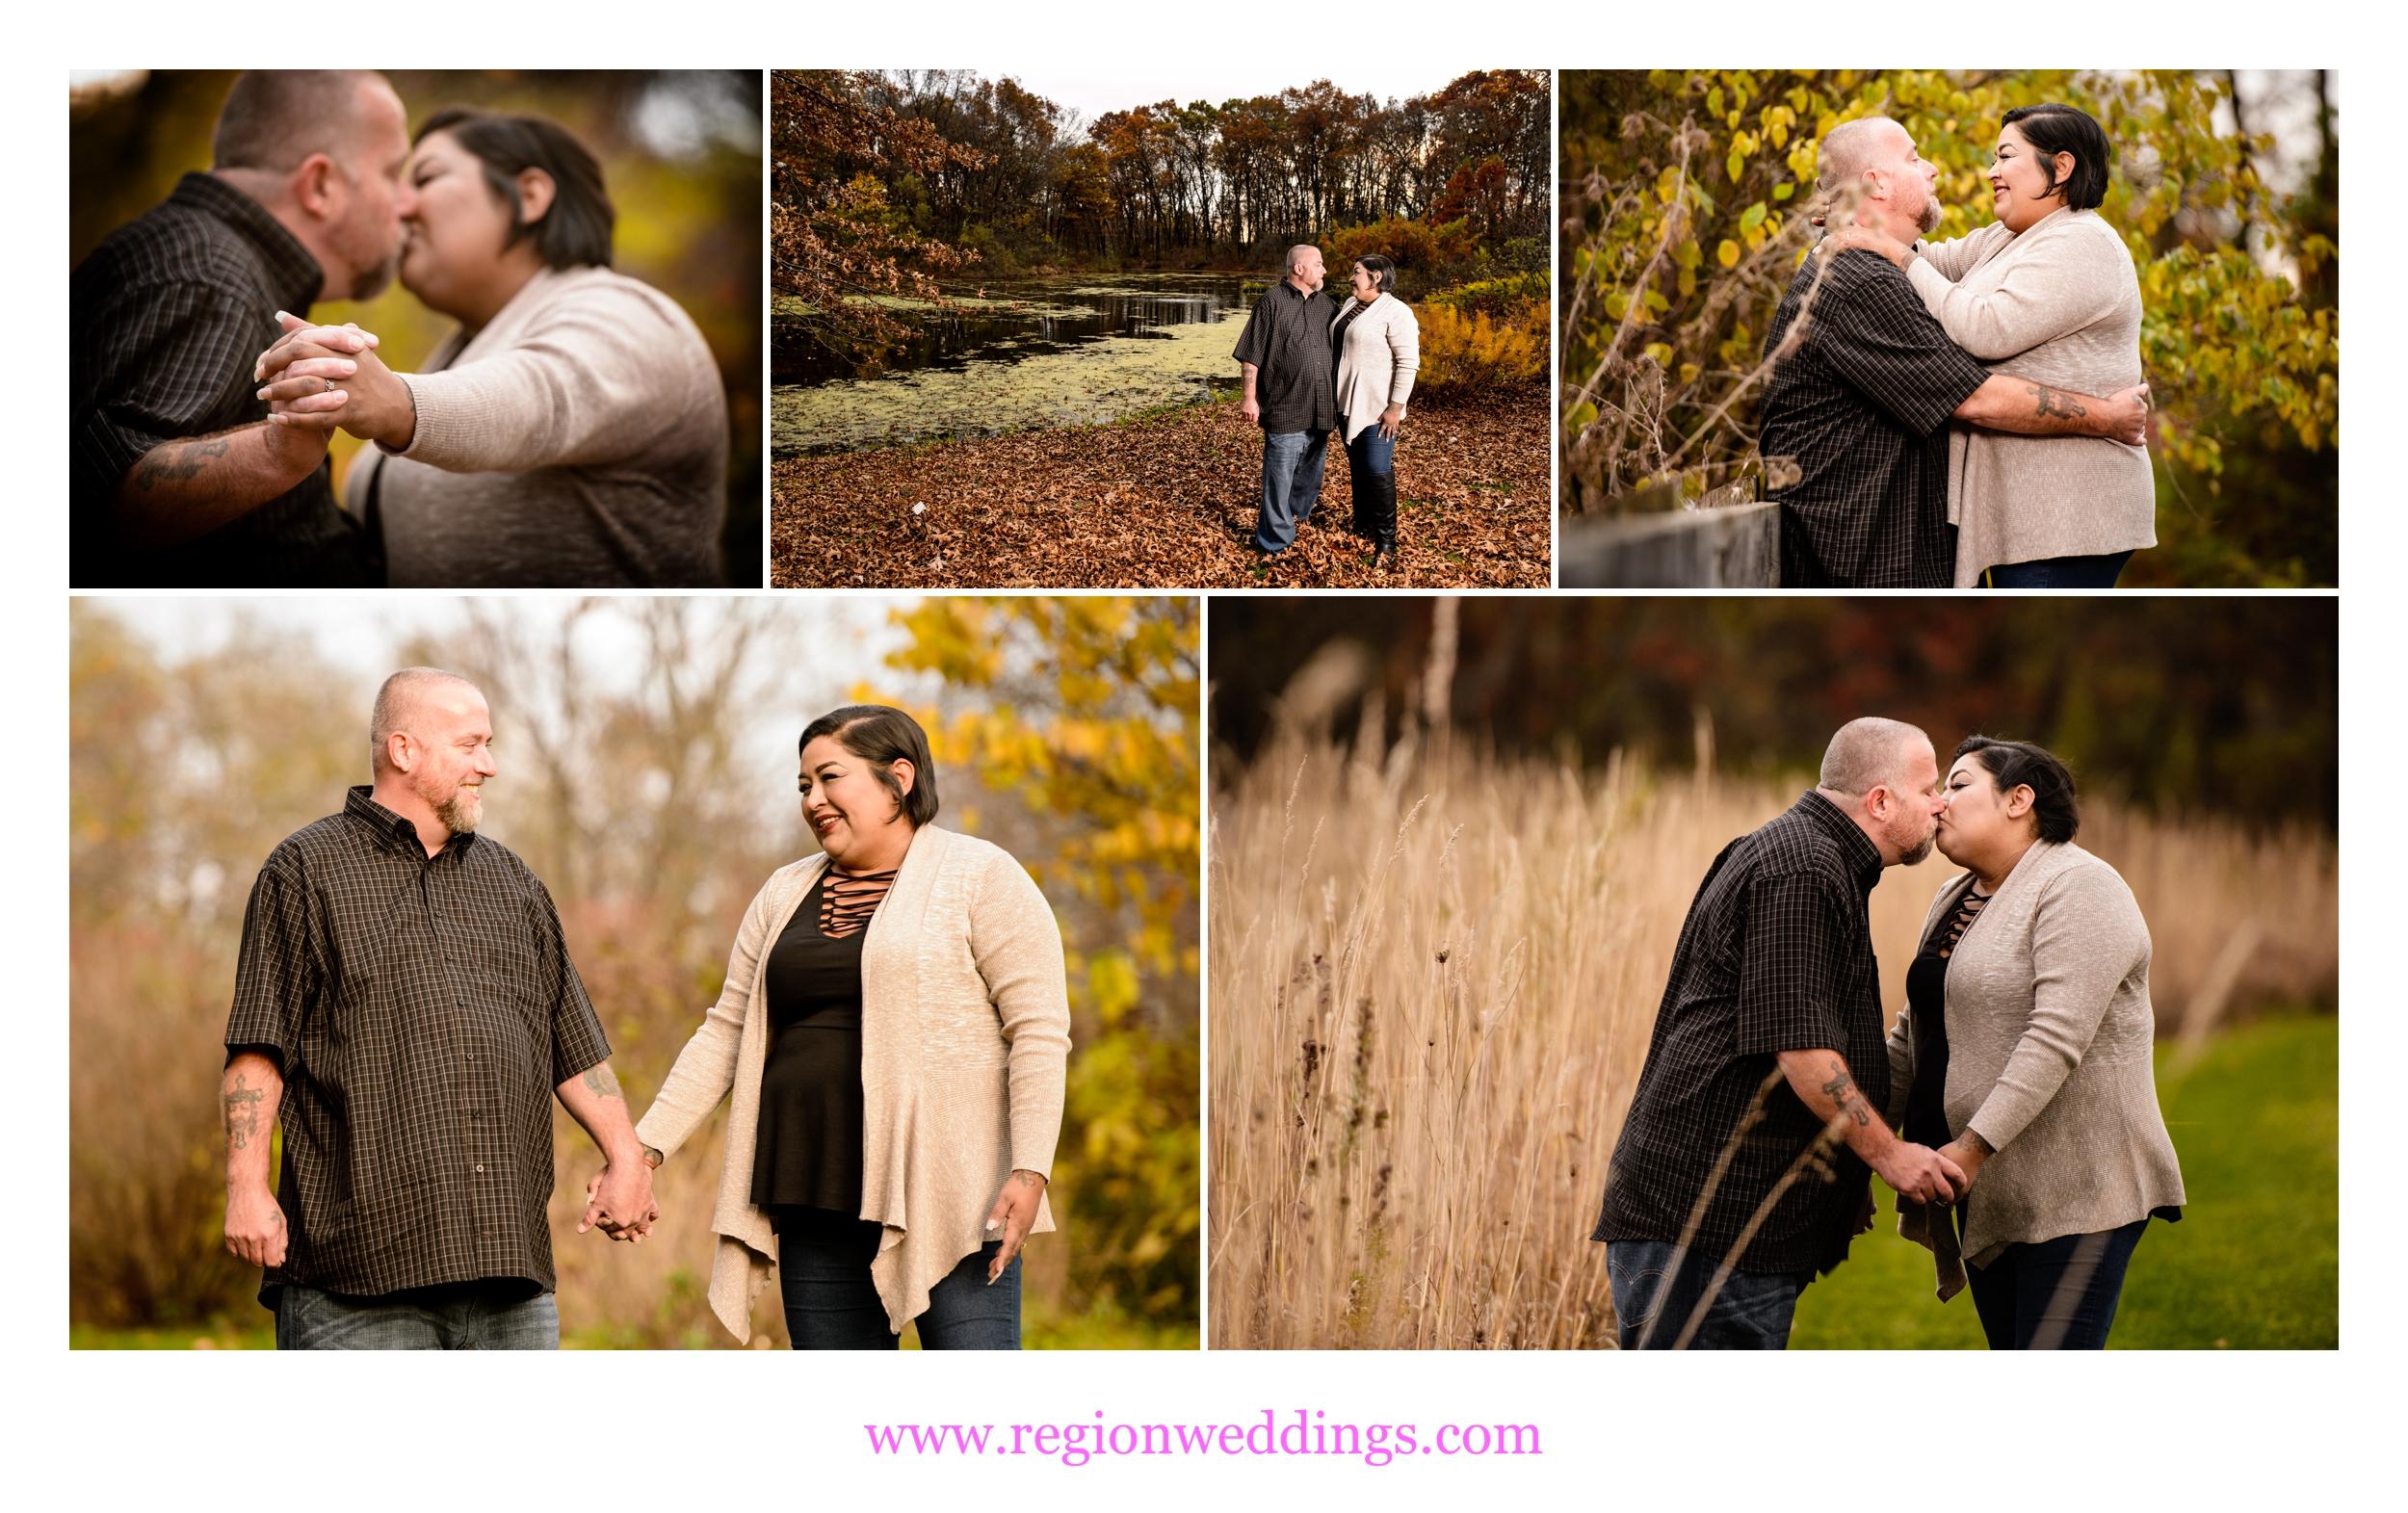 Fall engagement photos at Taltree Arboretum.